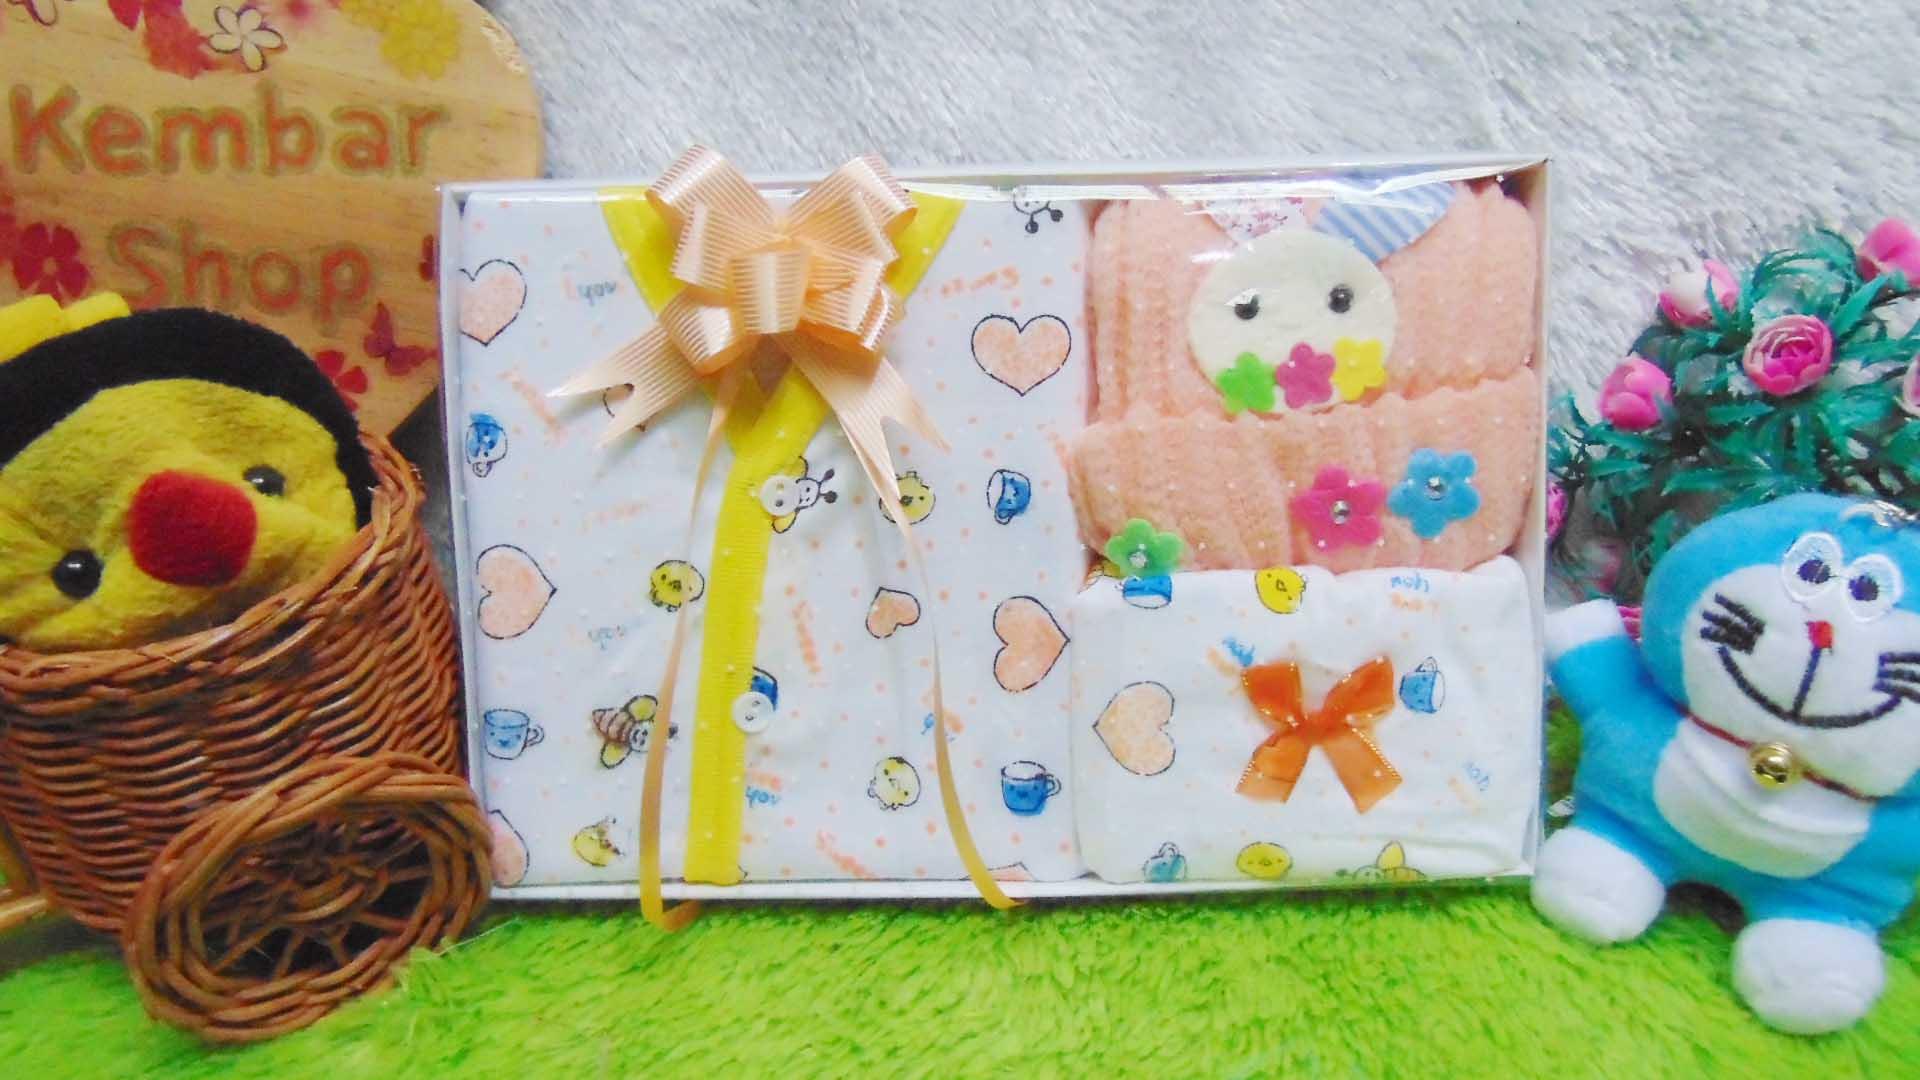 FREE KARTU UCAPAN Kado Lahiran Paket Kado Bayi Newborn Baby Gift Box Lebah Rajut Full Package Aneka Warna (7)